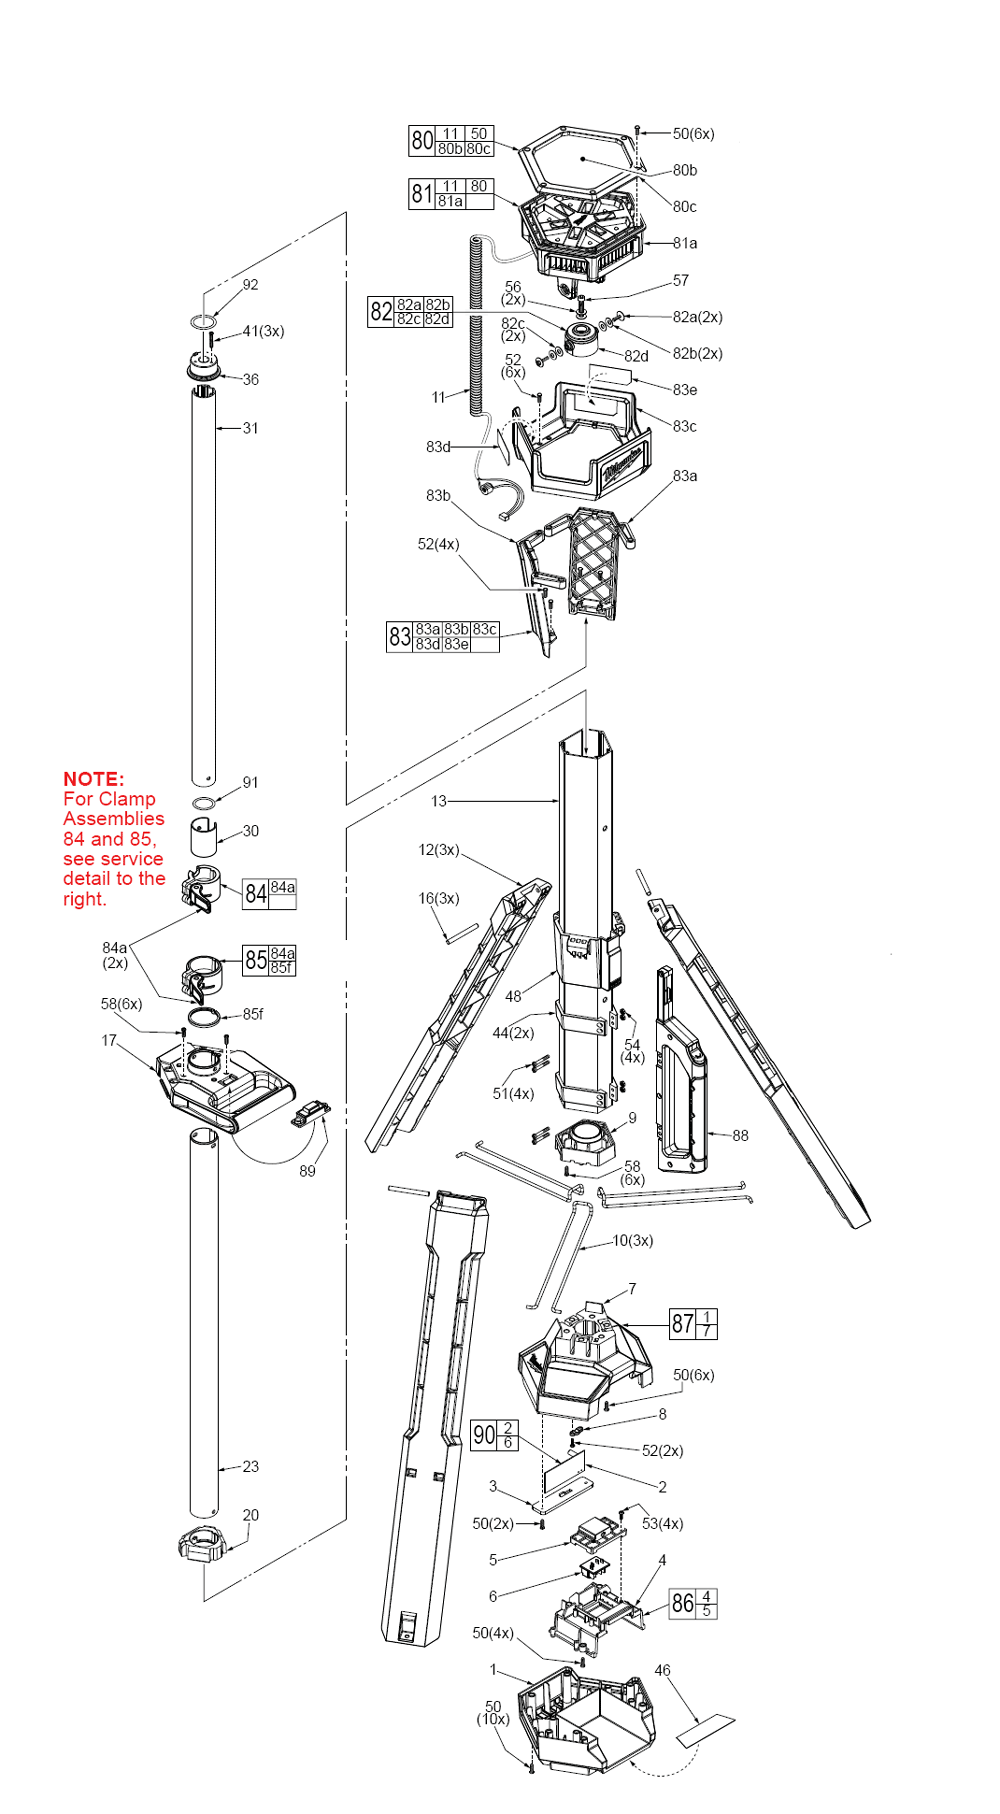 light stand diagram